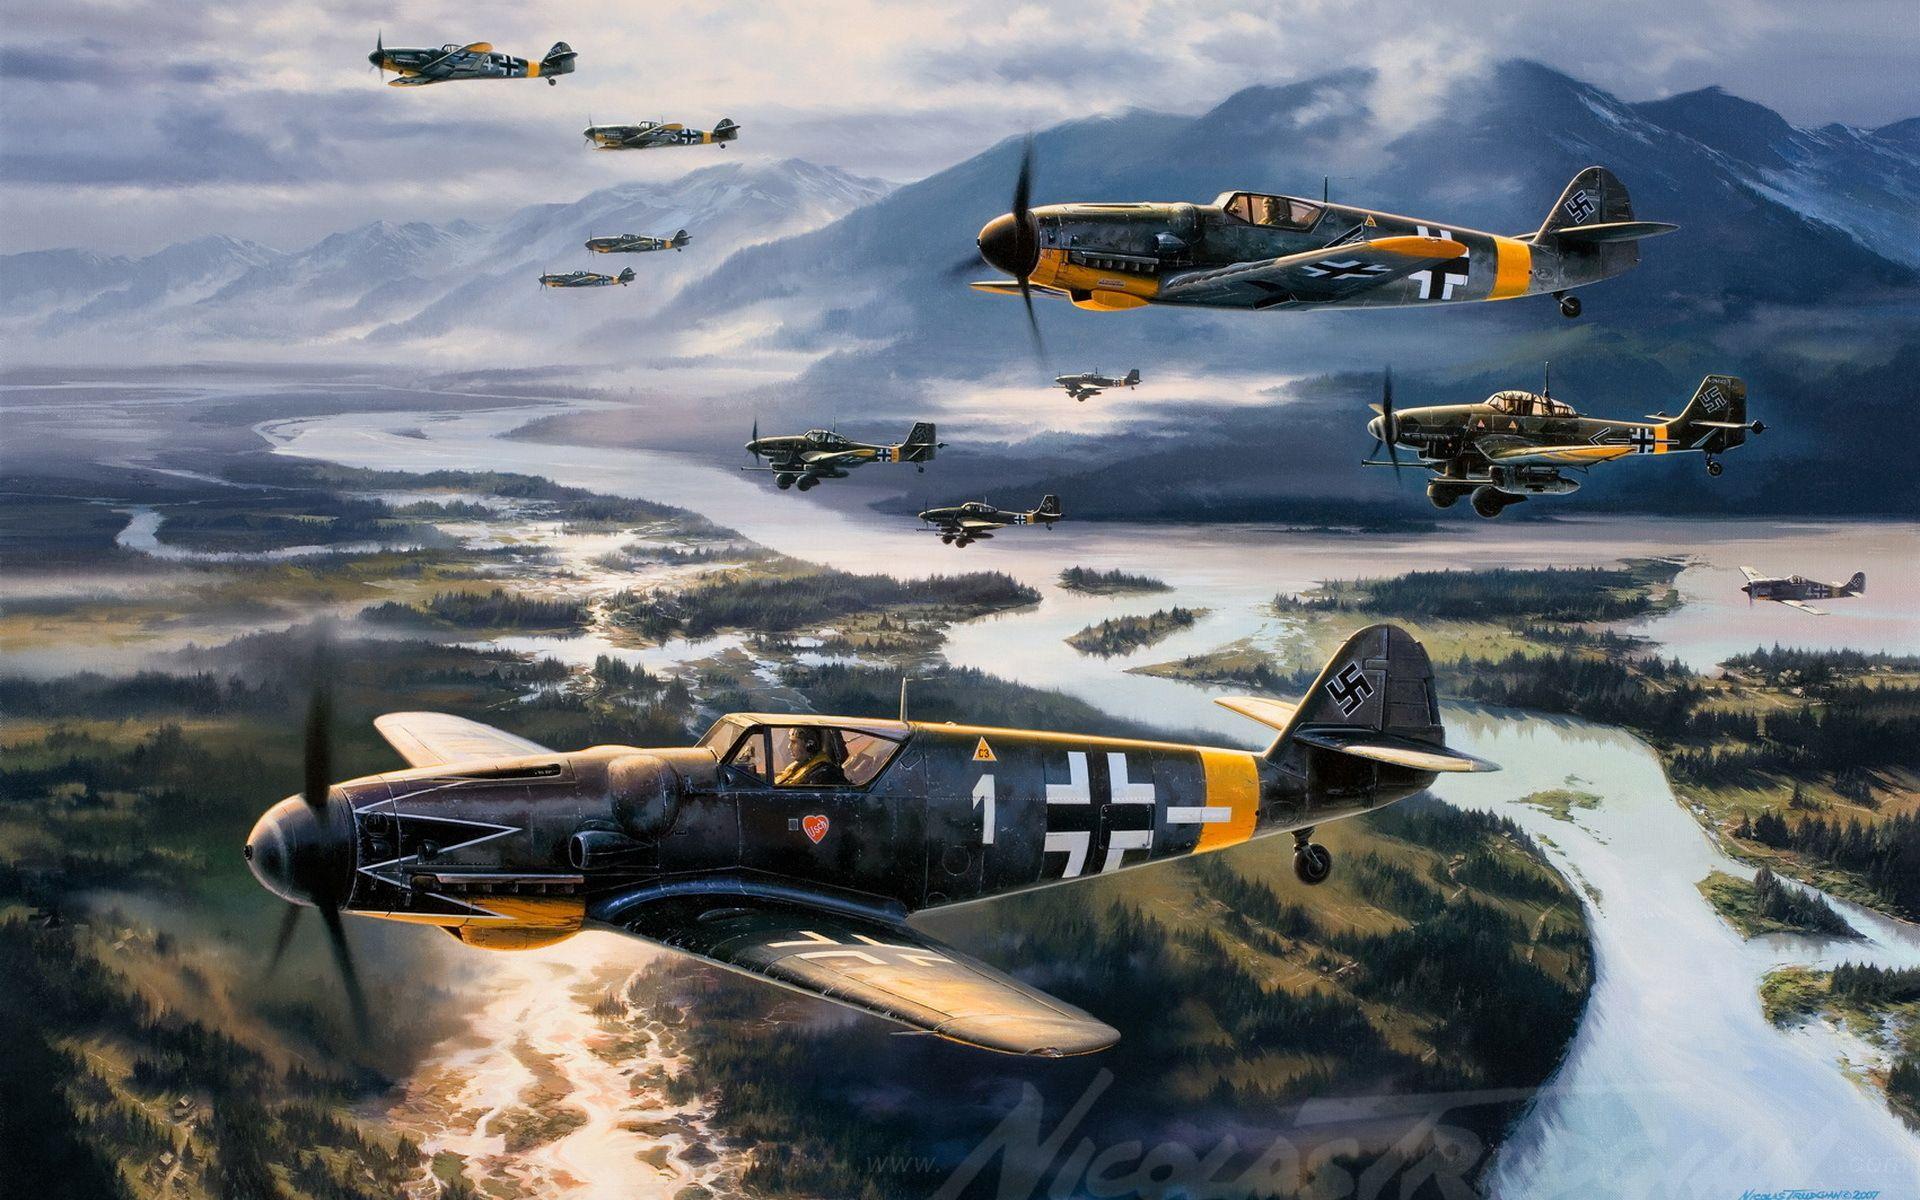 Обои Bf 109 k4, war, painting, german fighter, ww2, aviation. Авиация foto 11